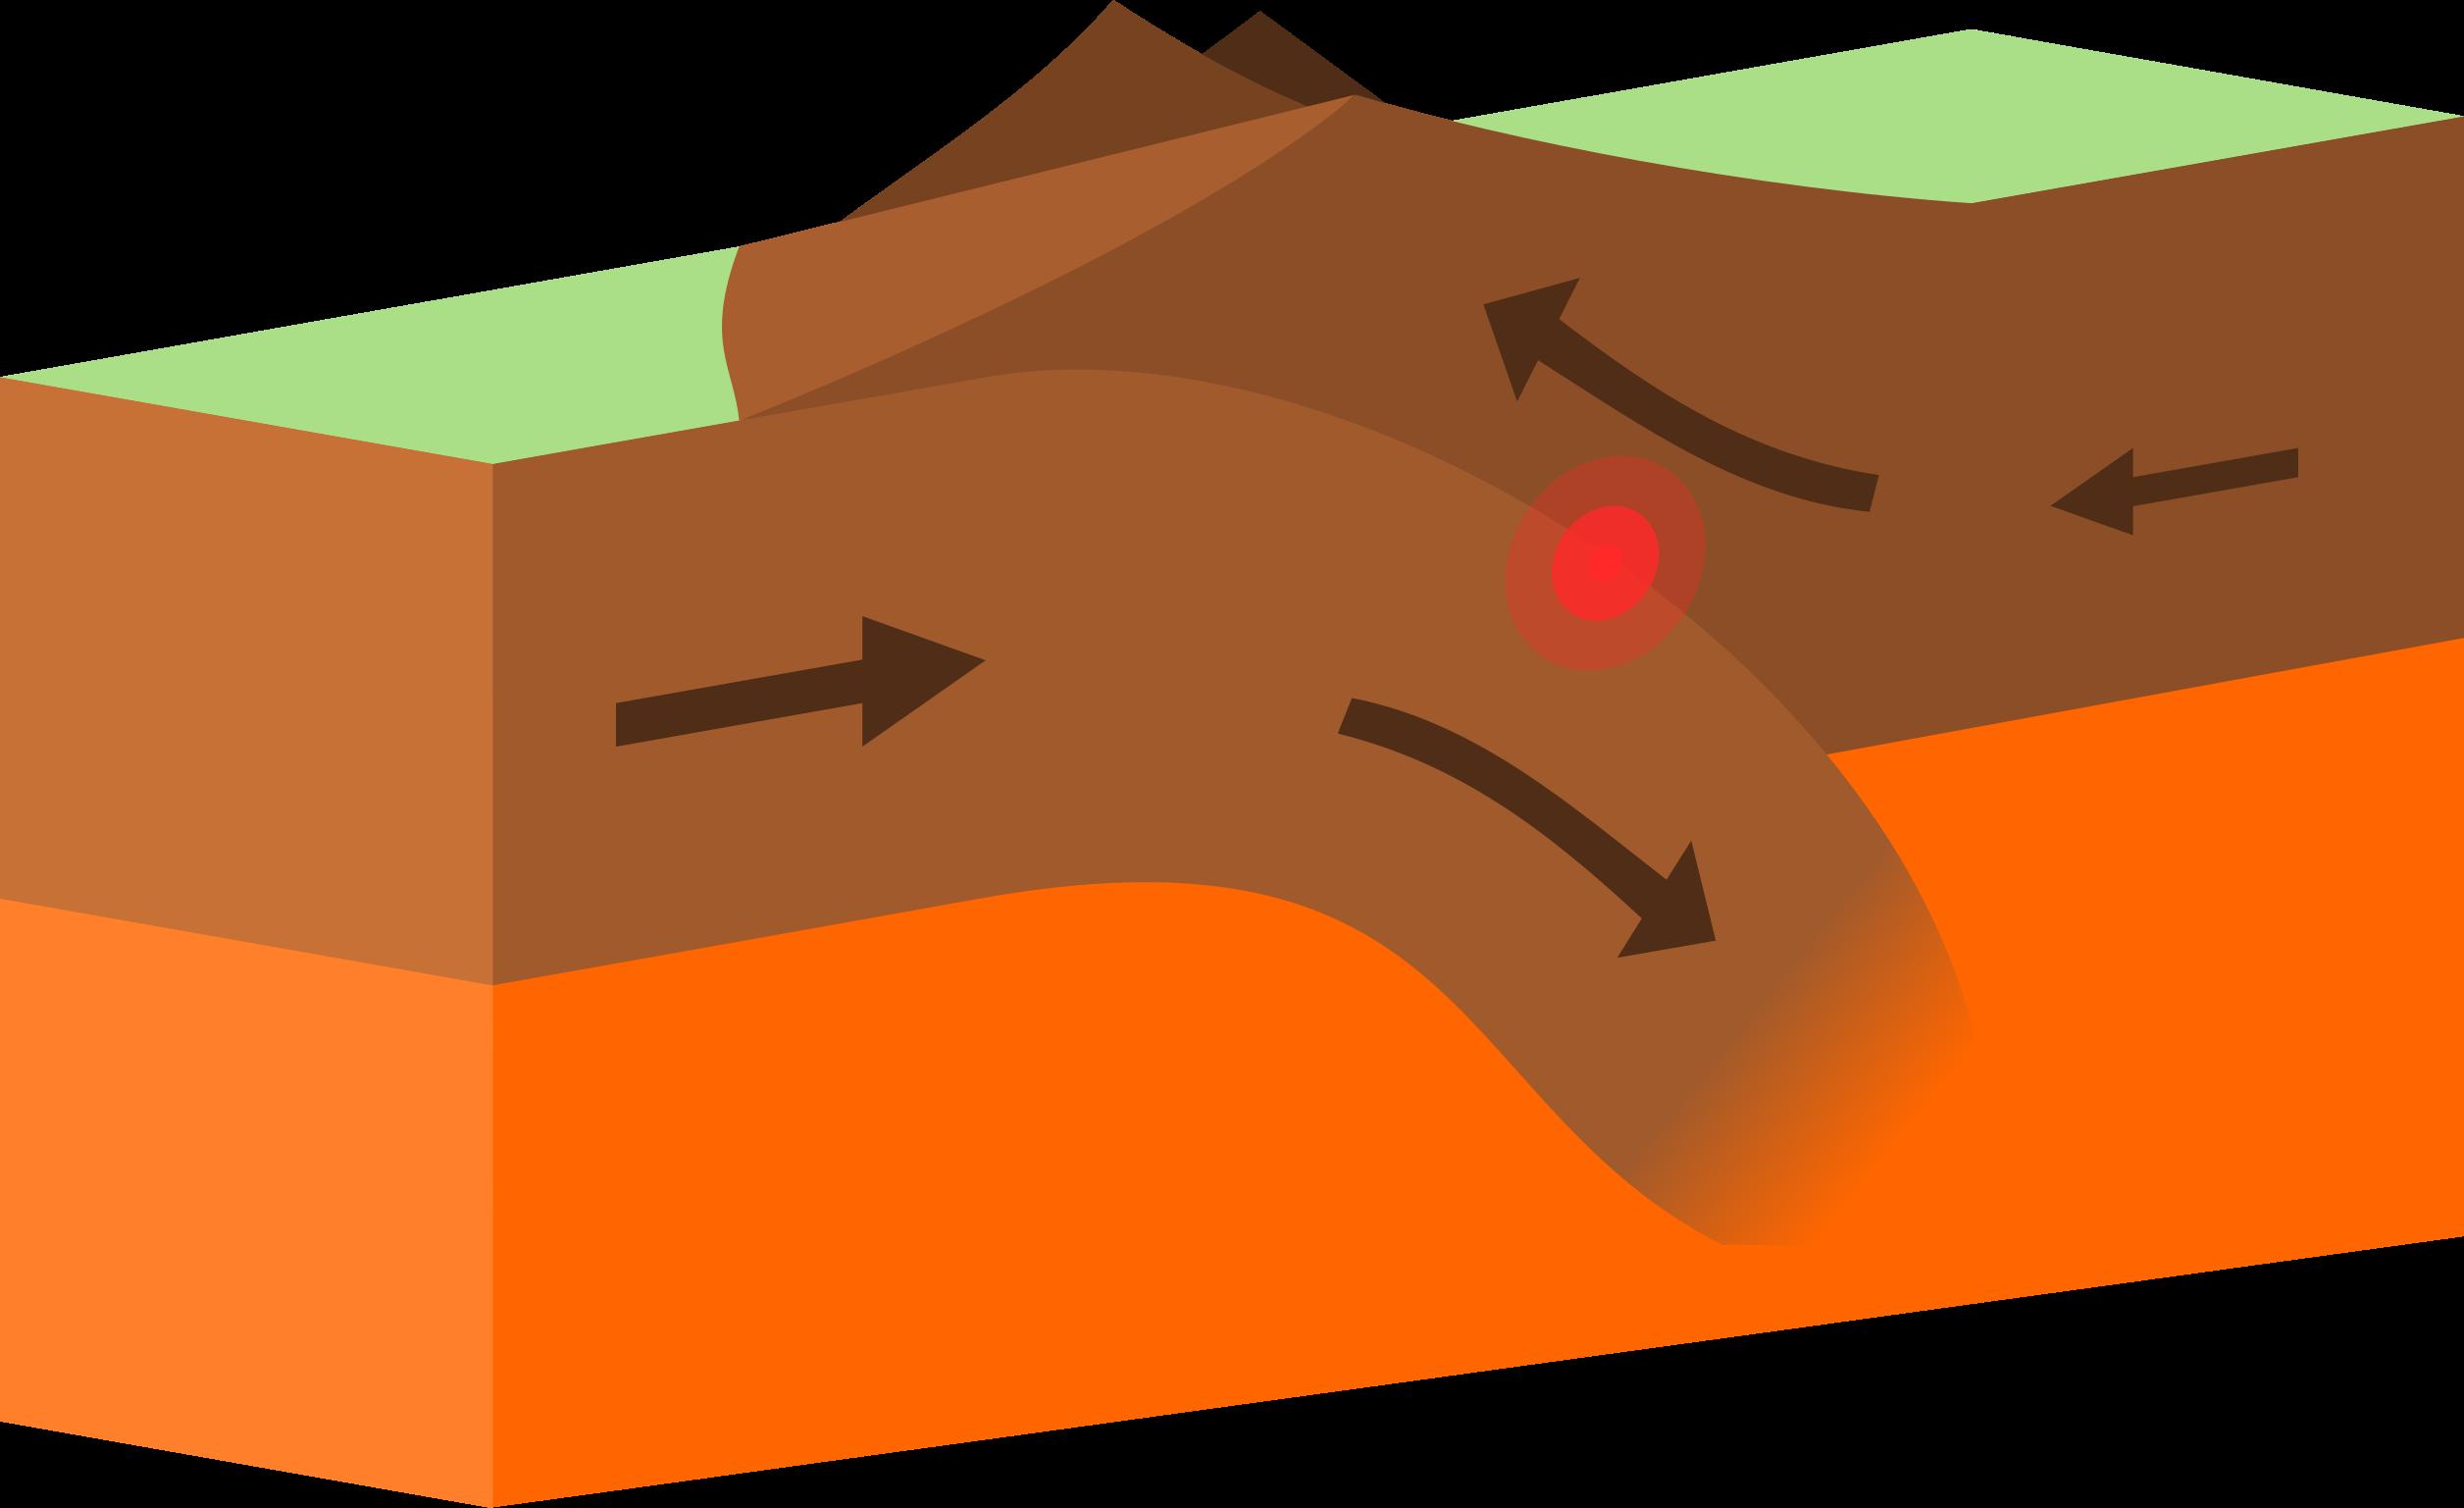 Earthquake clipart volcanic eruption.  px continental destructive